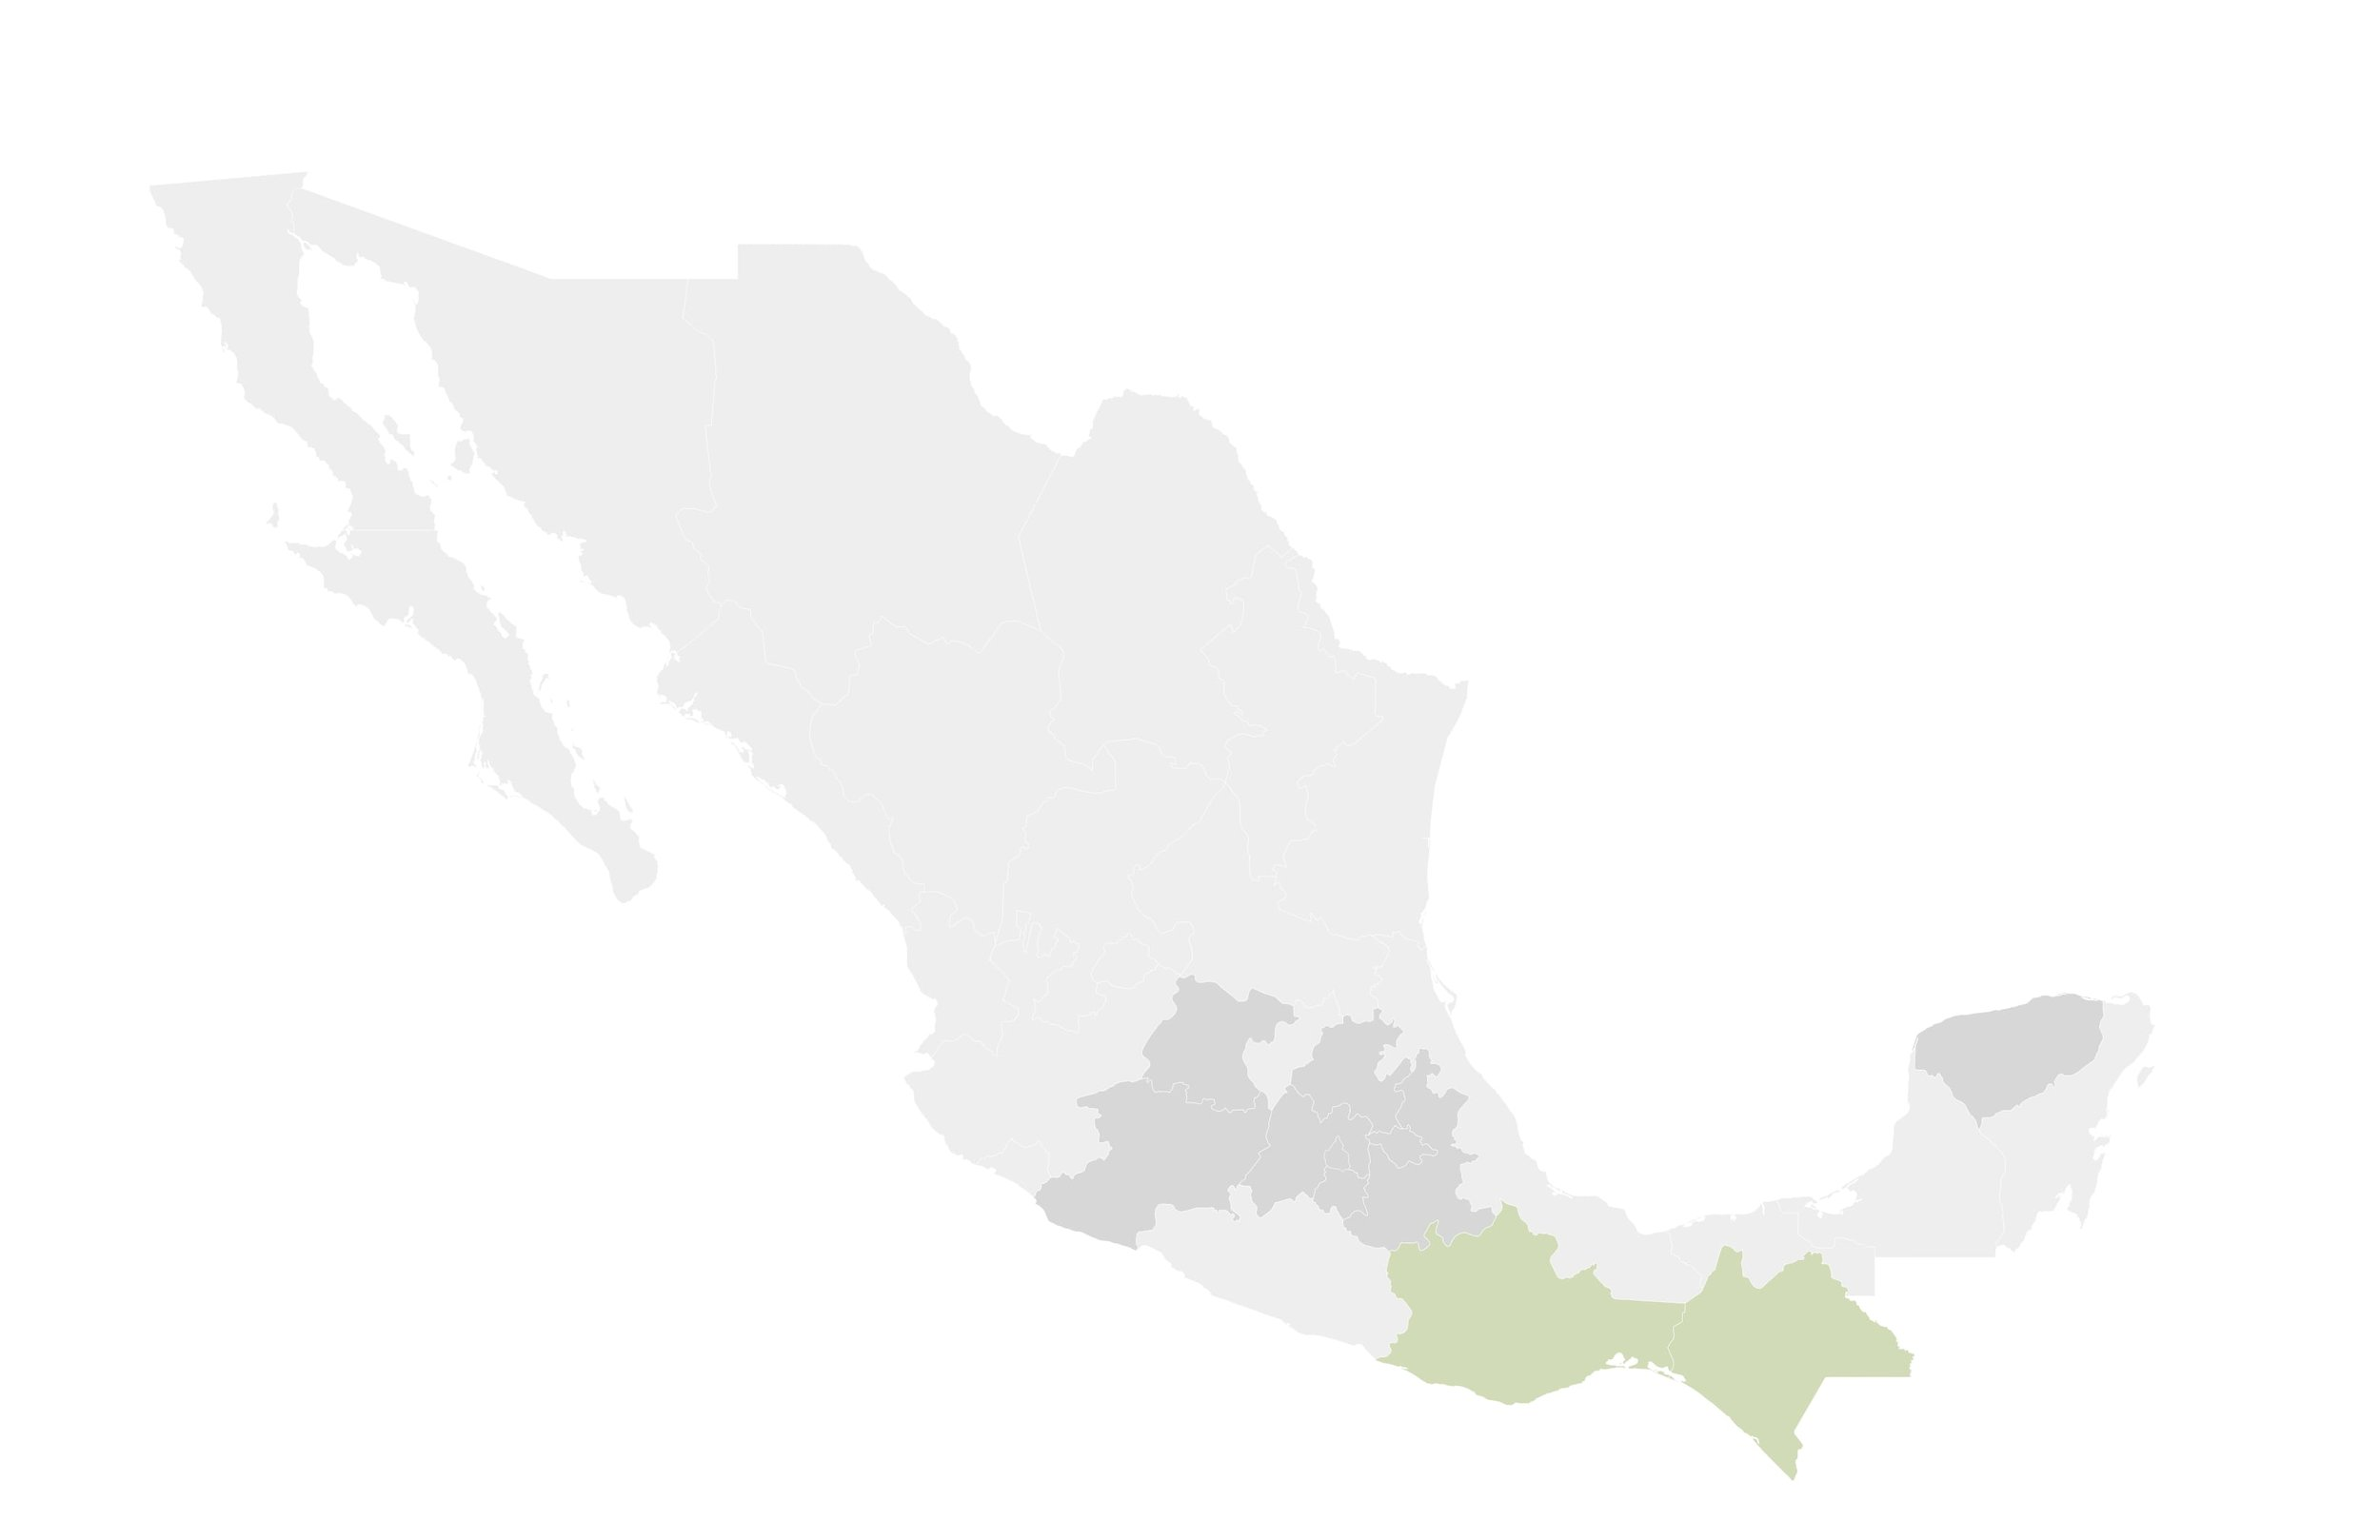 Zona Sur - Chiapas I Oaxaca